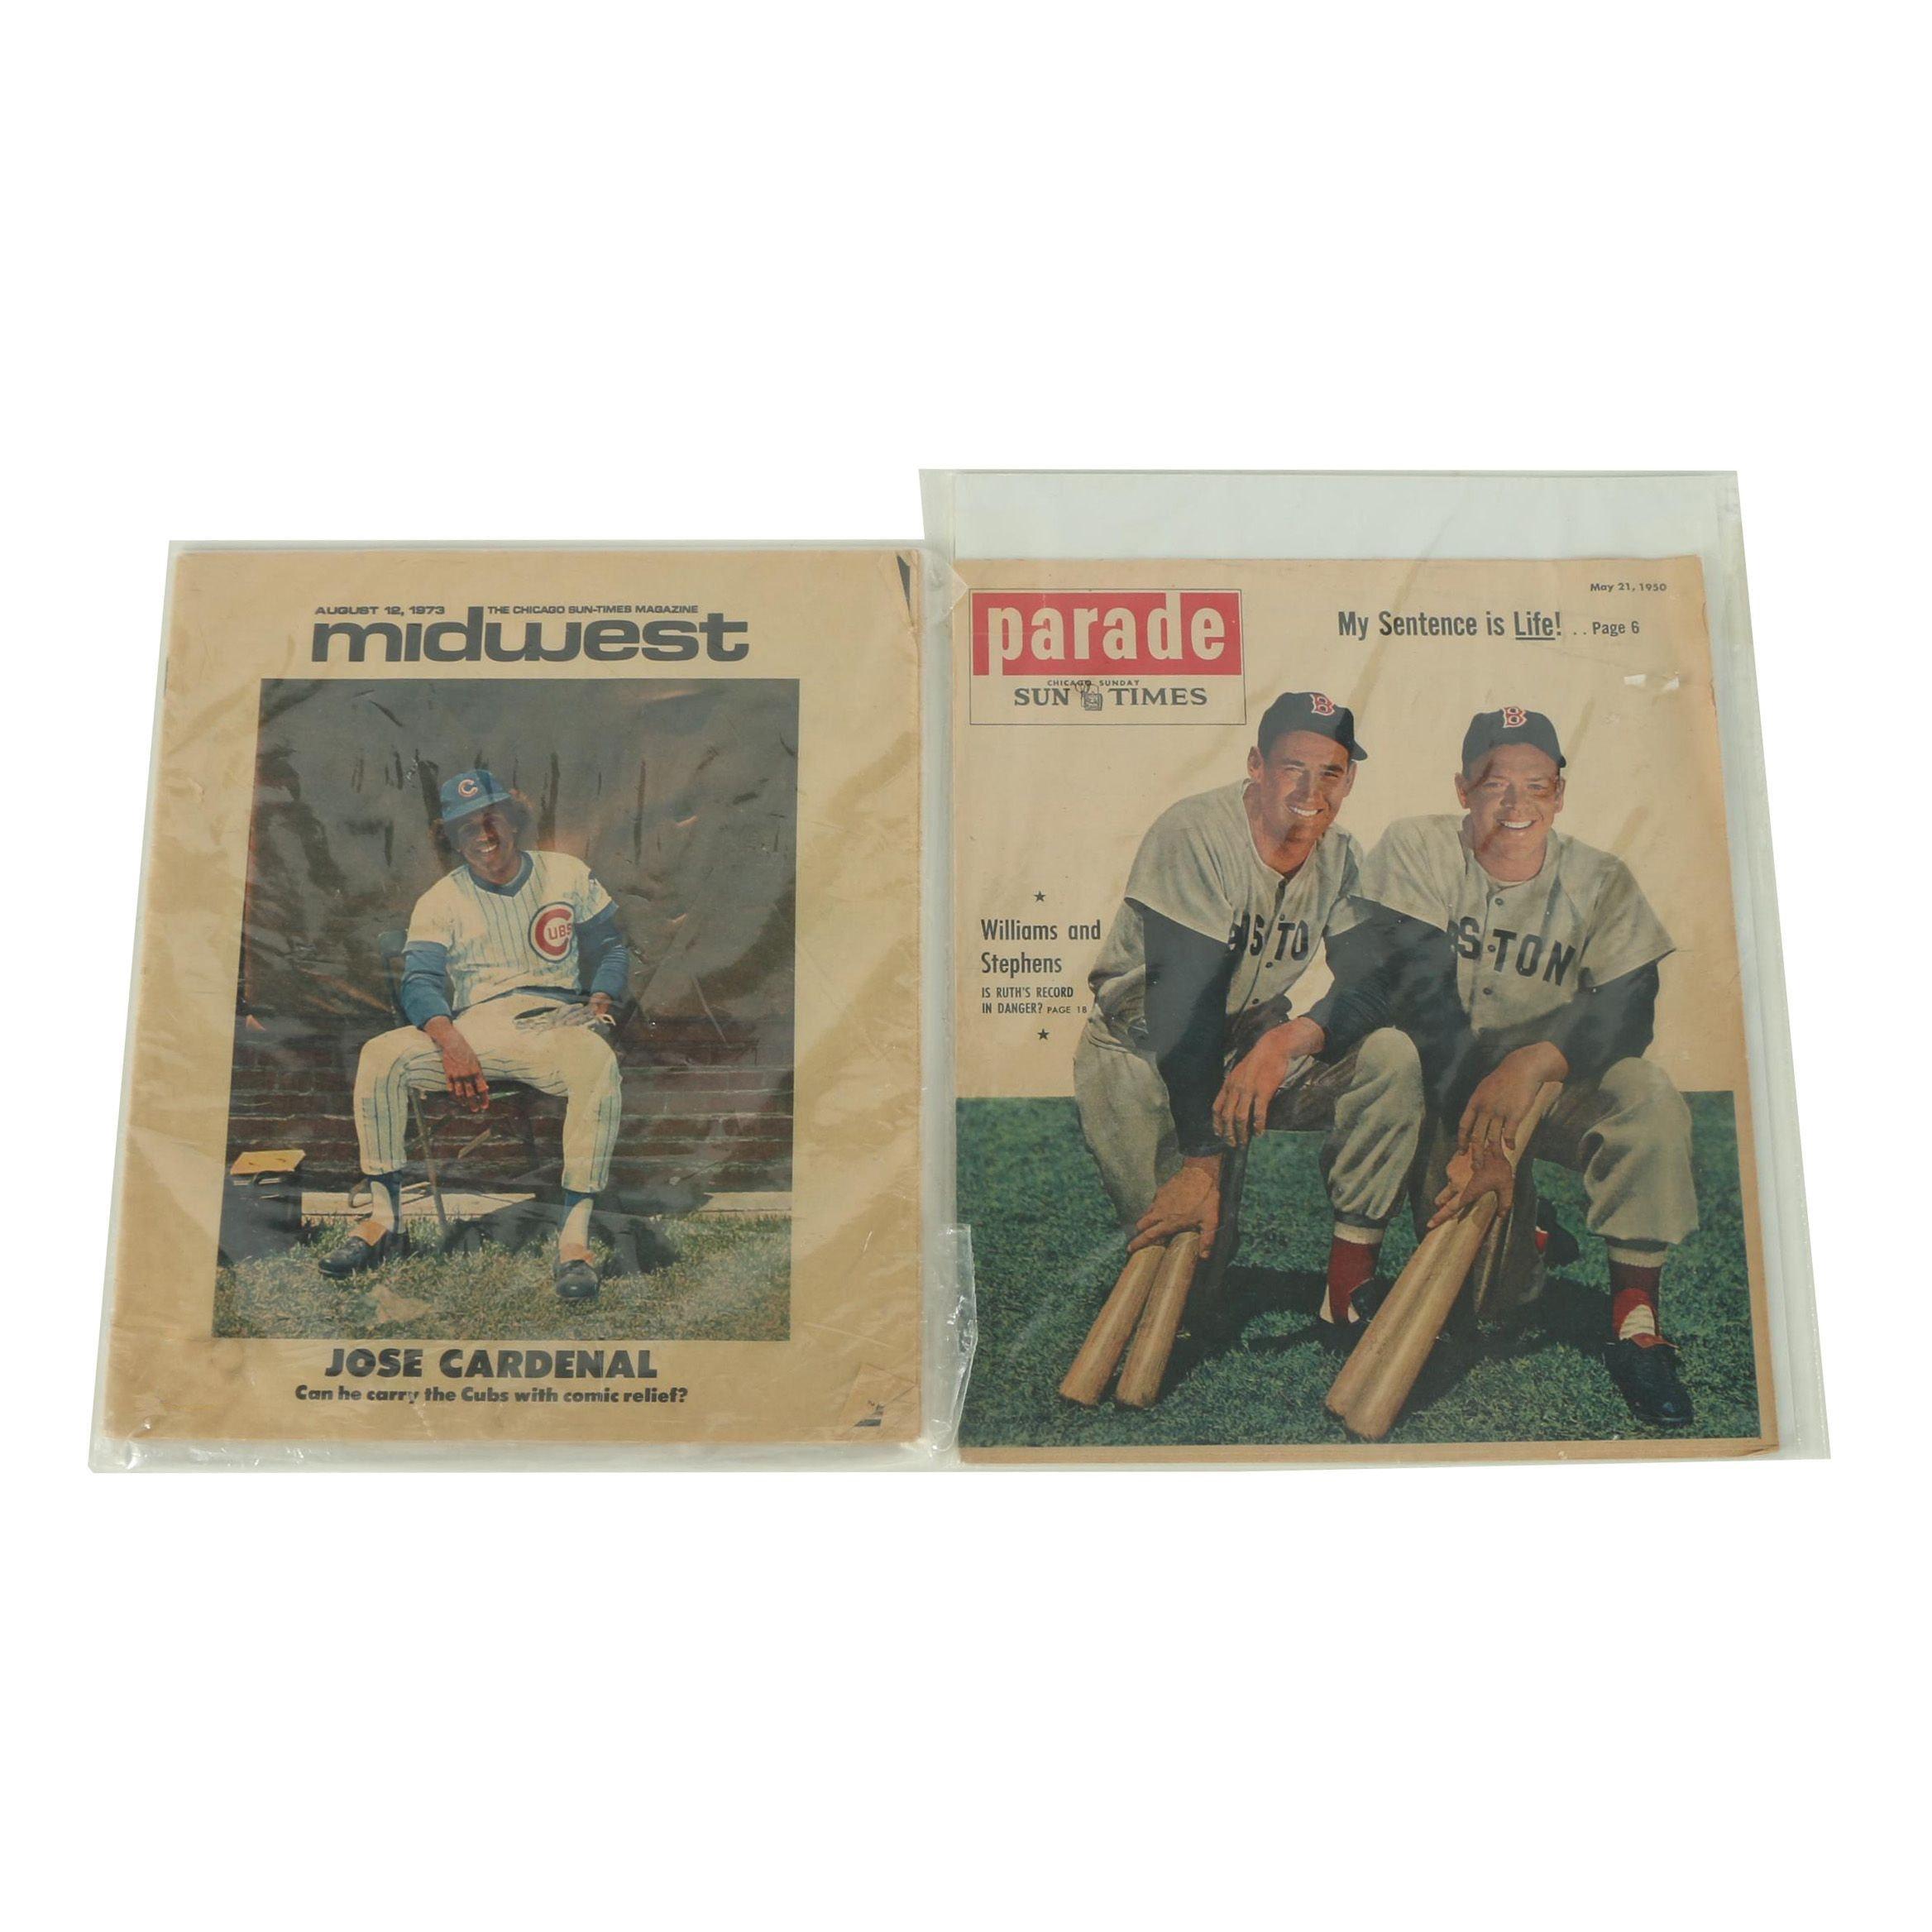 Pair of Vintage Chicago News Magazines